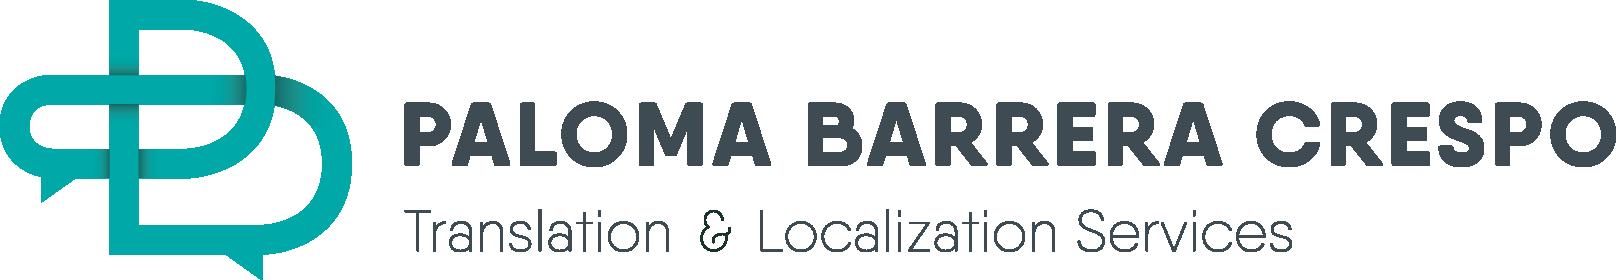 Paloma Barrera Crespo | Translation & Localization Services